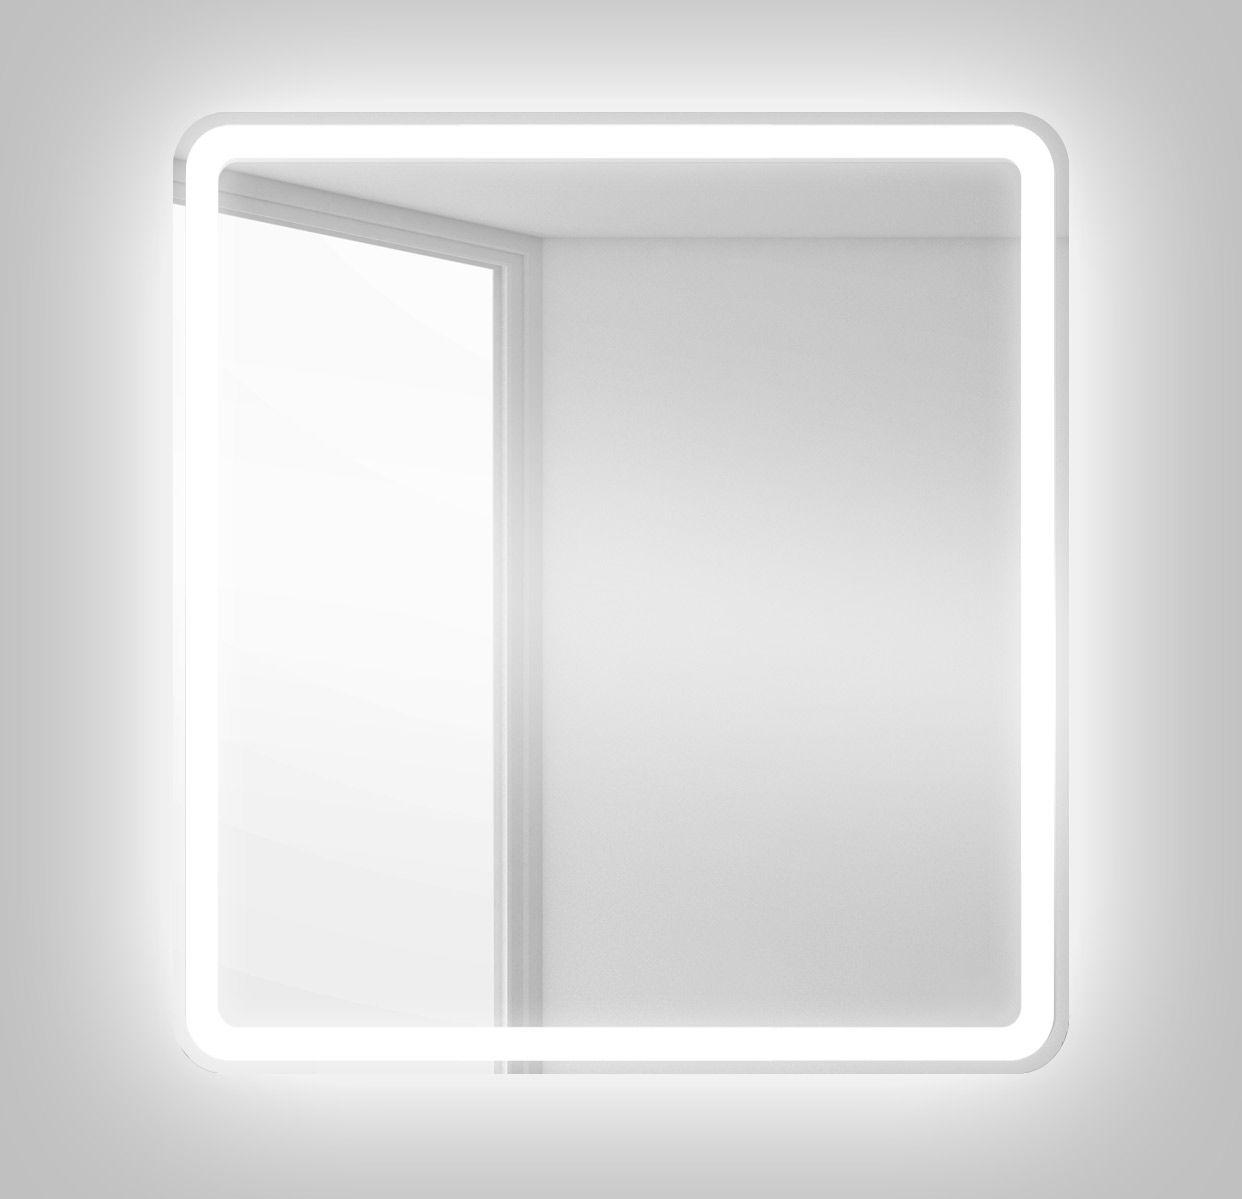 Зеркало для ванной BelBagno SPC-MAR-500-600-LED-BTN ФОТО